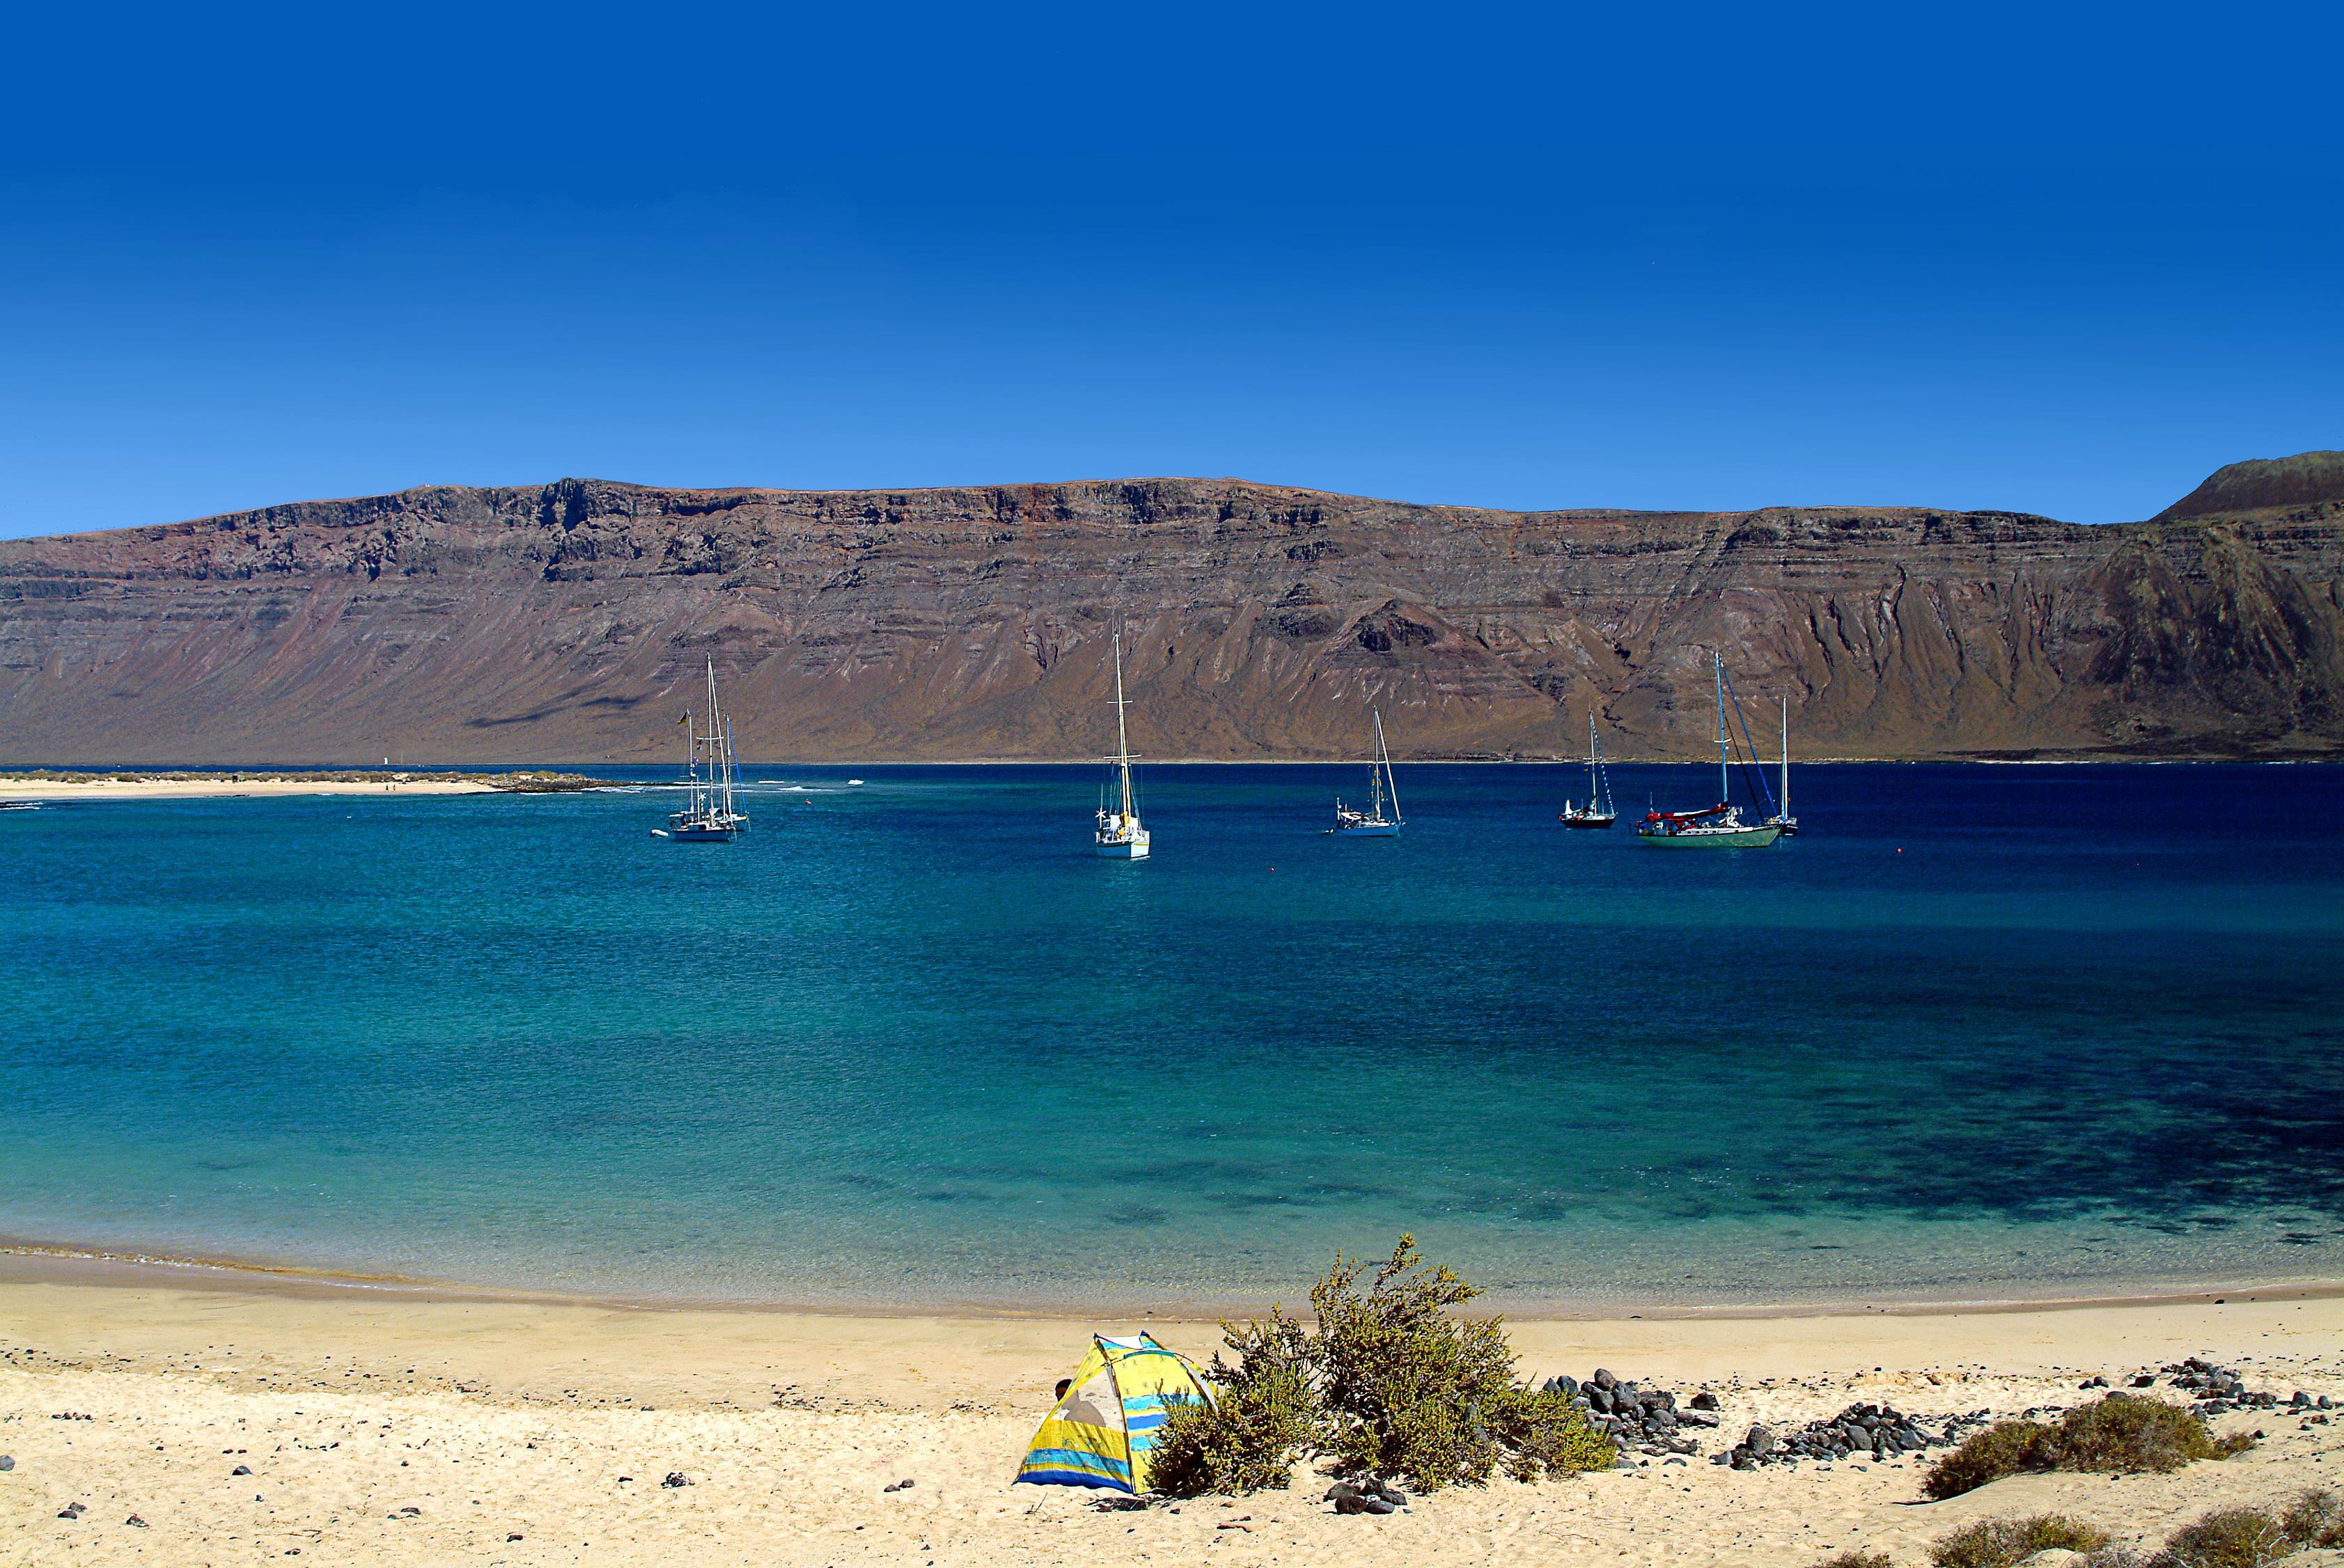 Noleggio Barche Playa Francesa – Isola di La Graciosa - Navalia | Noleggia un Sogno